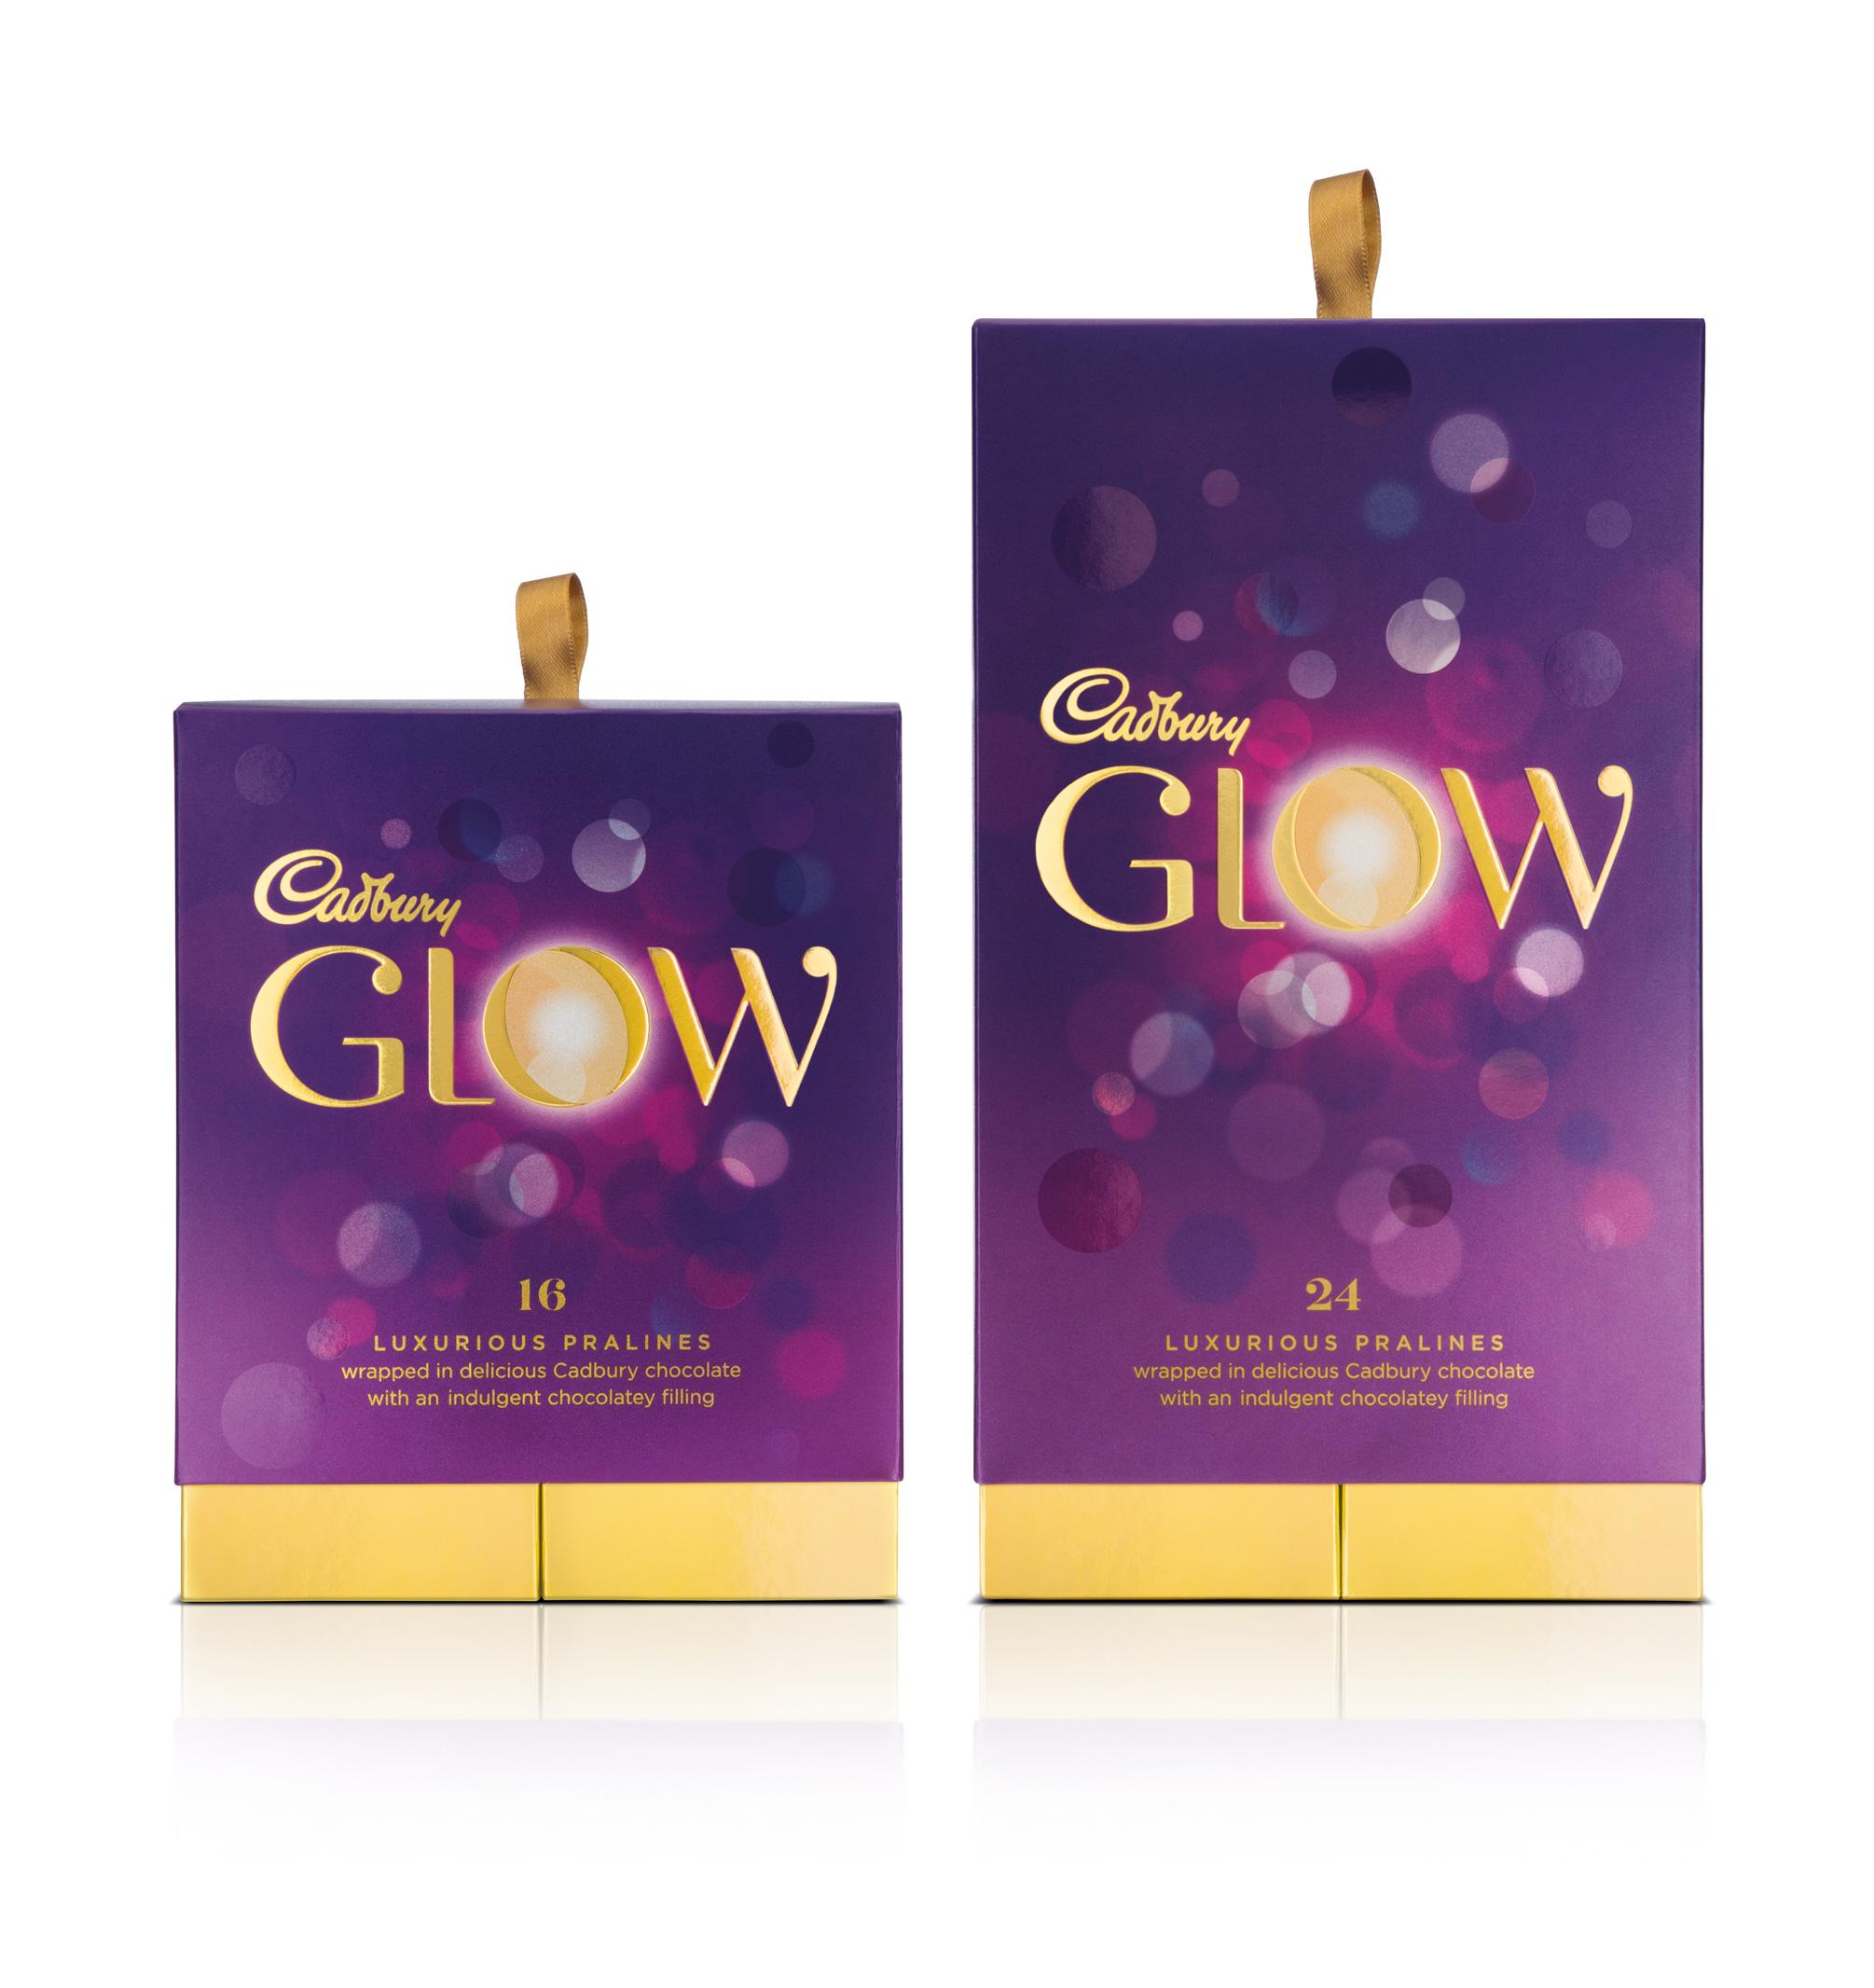 05_Cadbury Glow_02